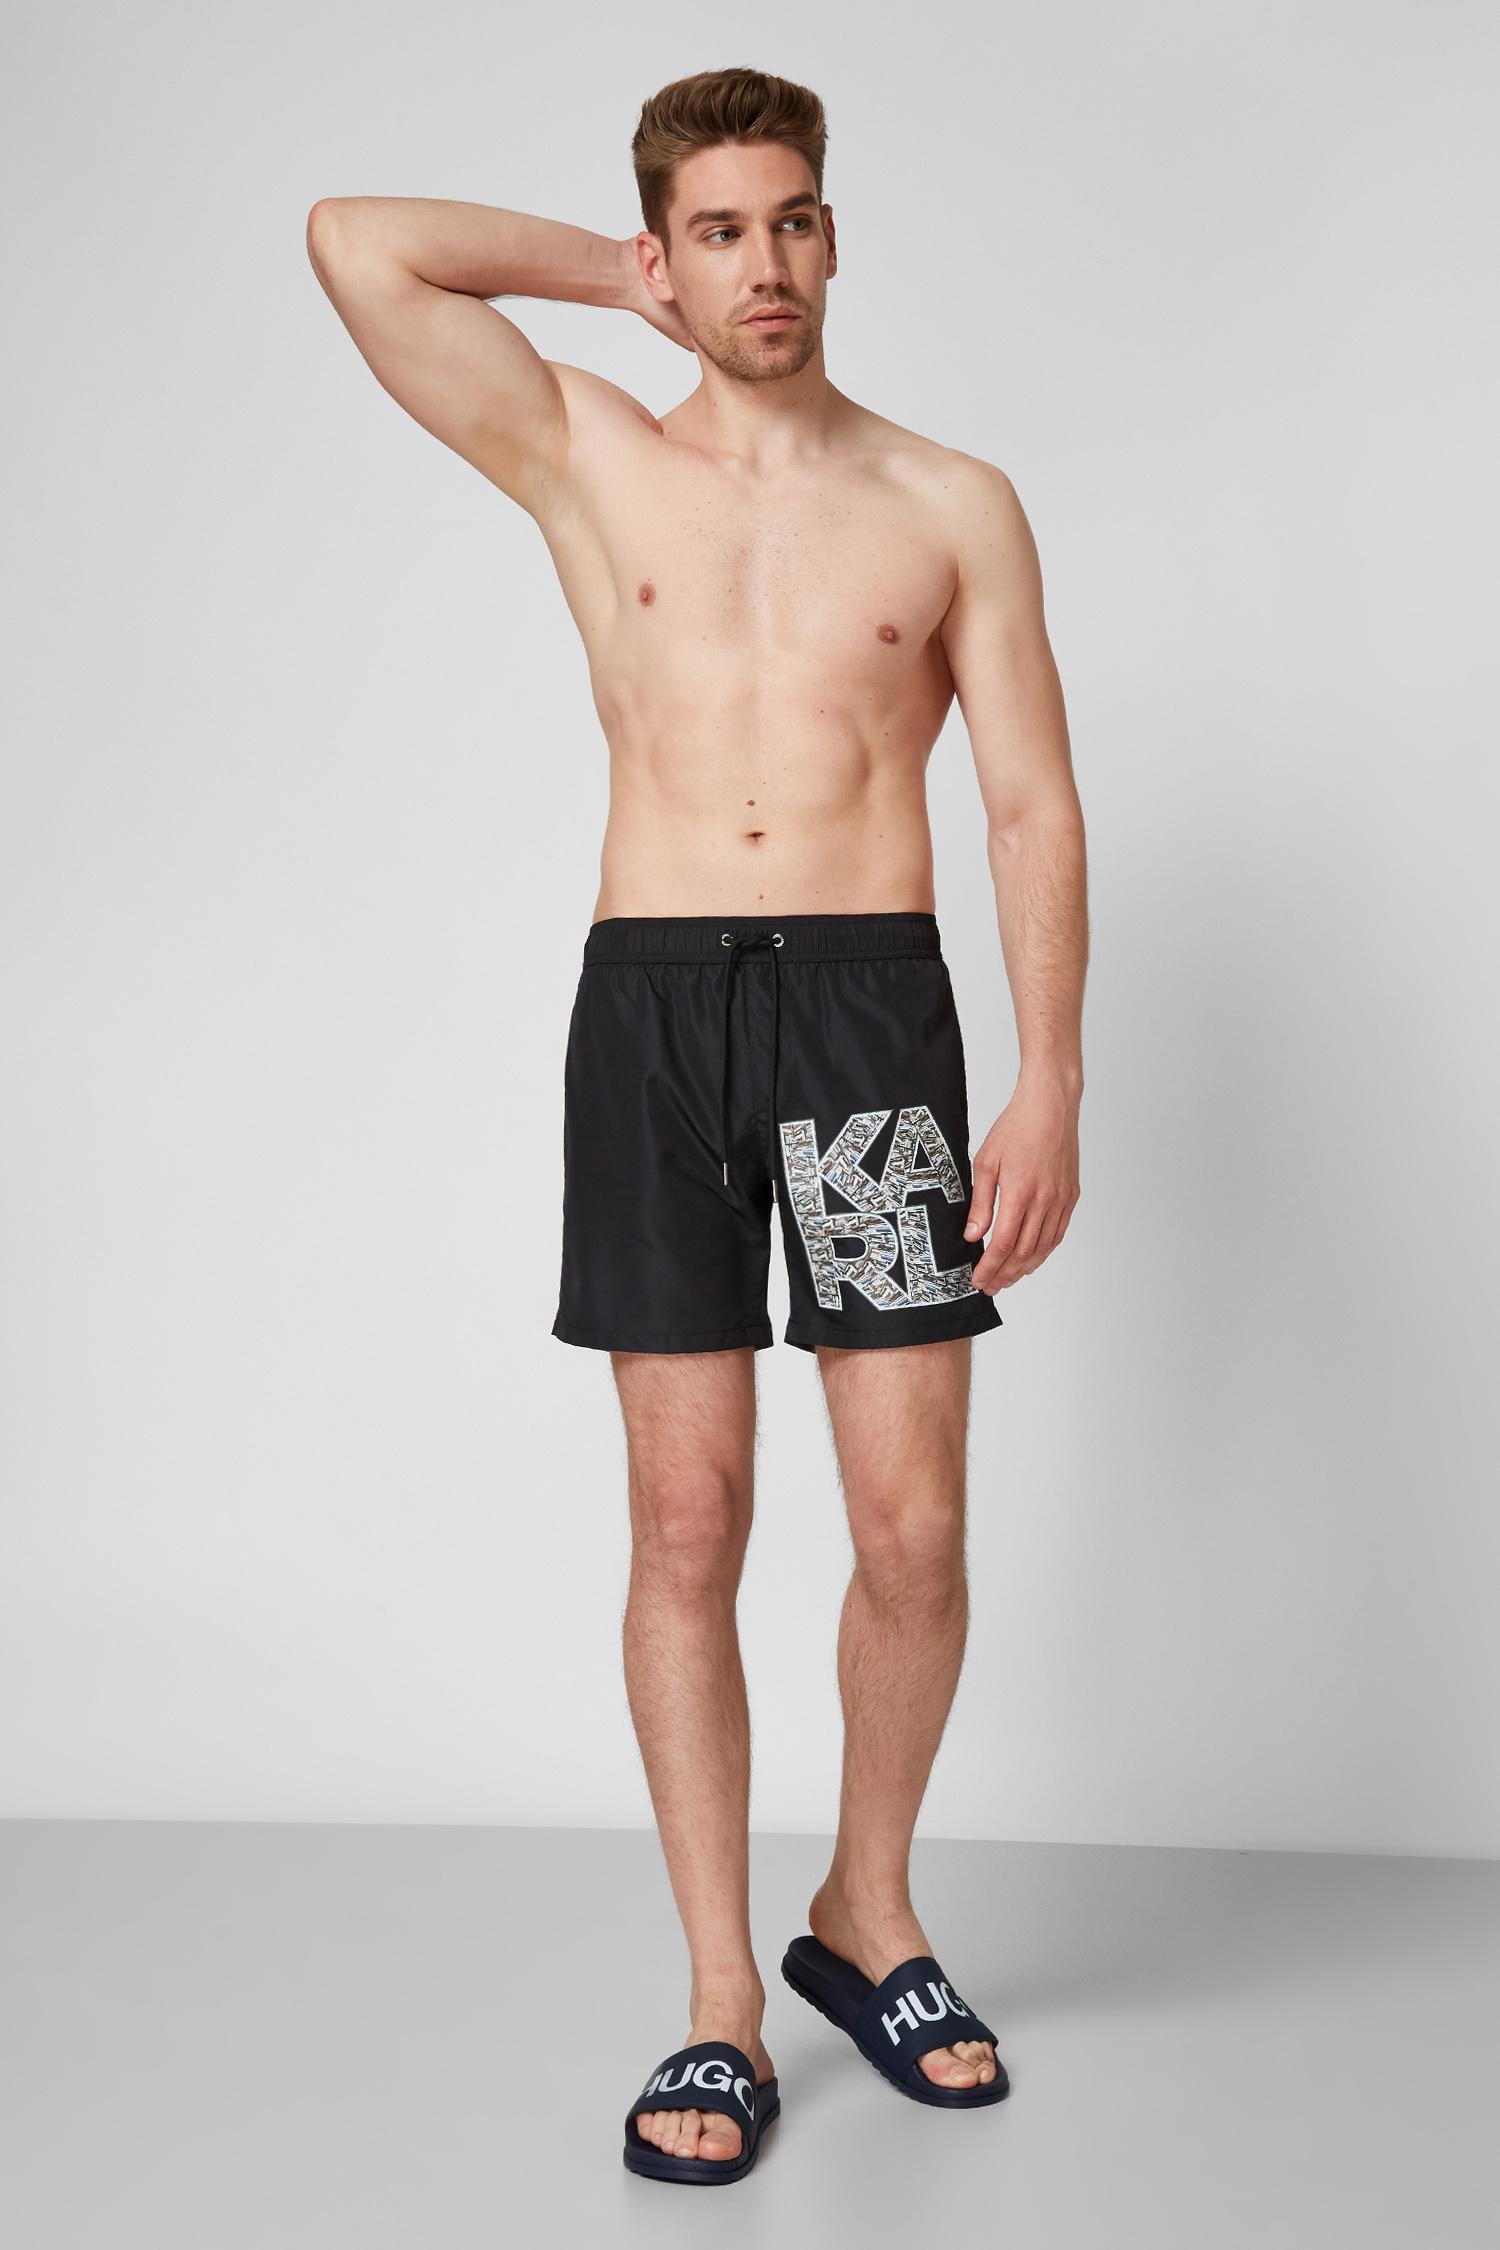 Мужские черные плавательные шорты Karl Lagerfeld KL21MBM02;ONE COLOUR